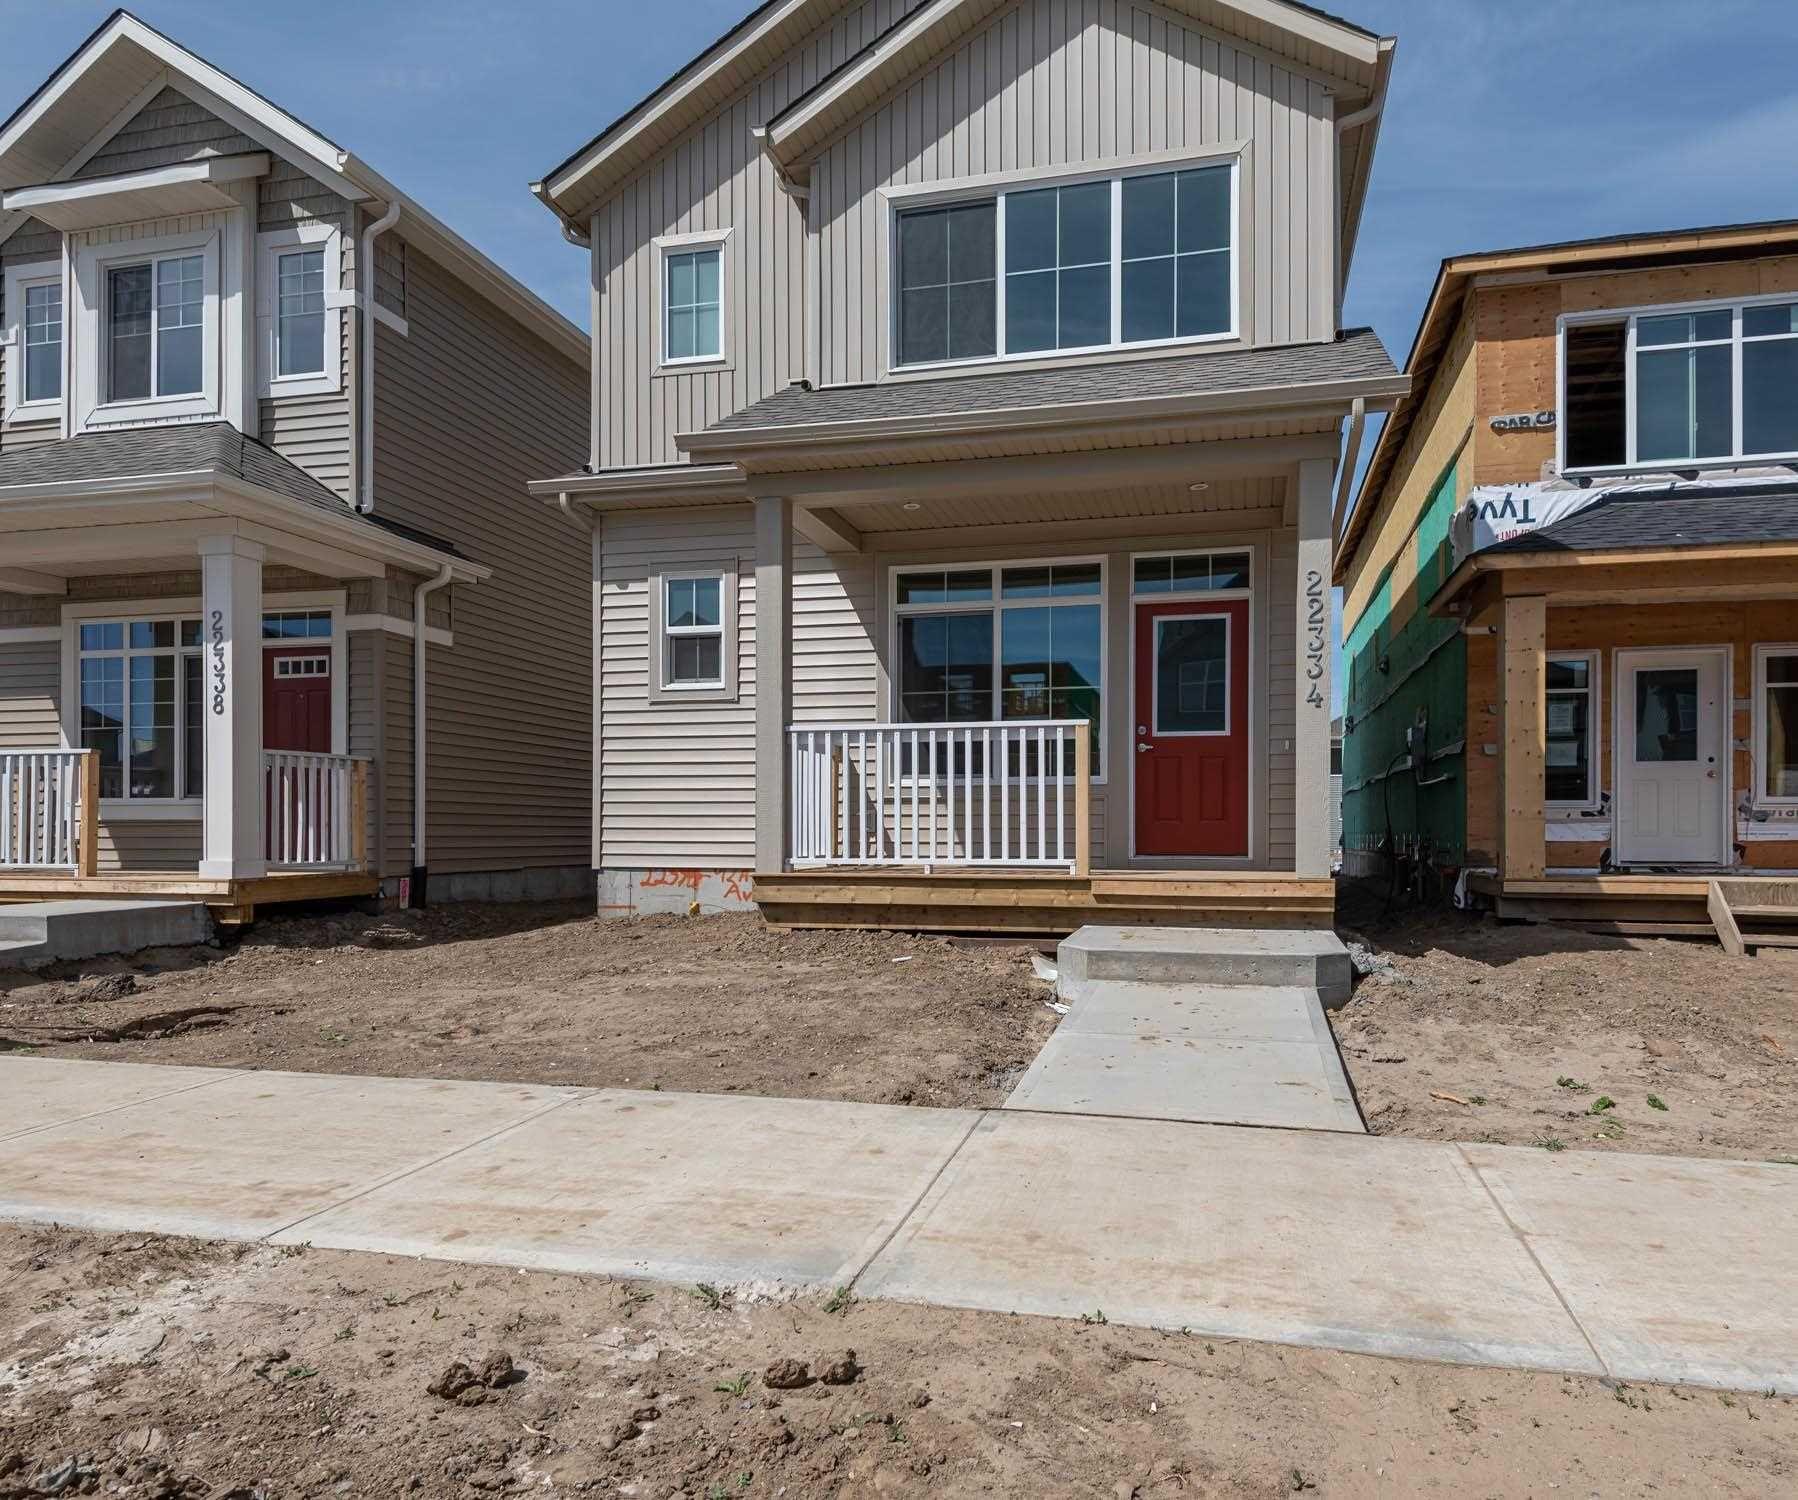 Main Photo: 22334 92A Avenue in Edmonton: Zone 58 House for sale : MLS®# E4247634